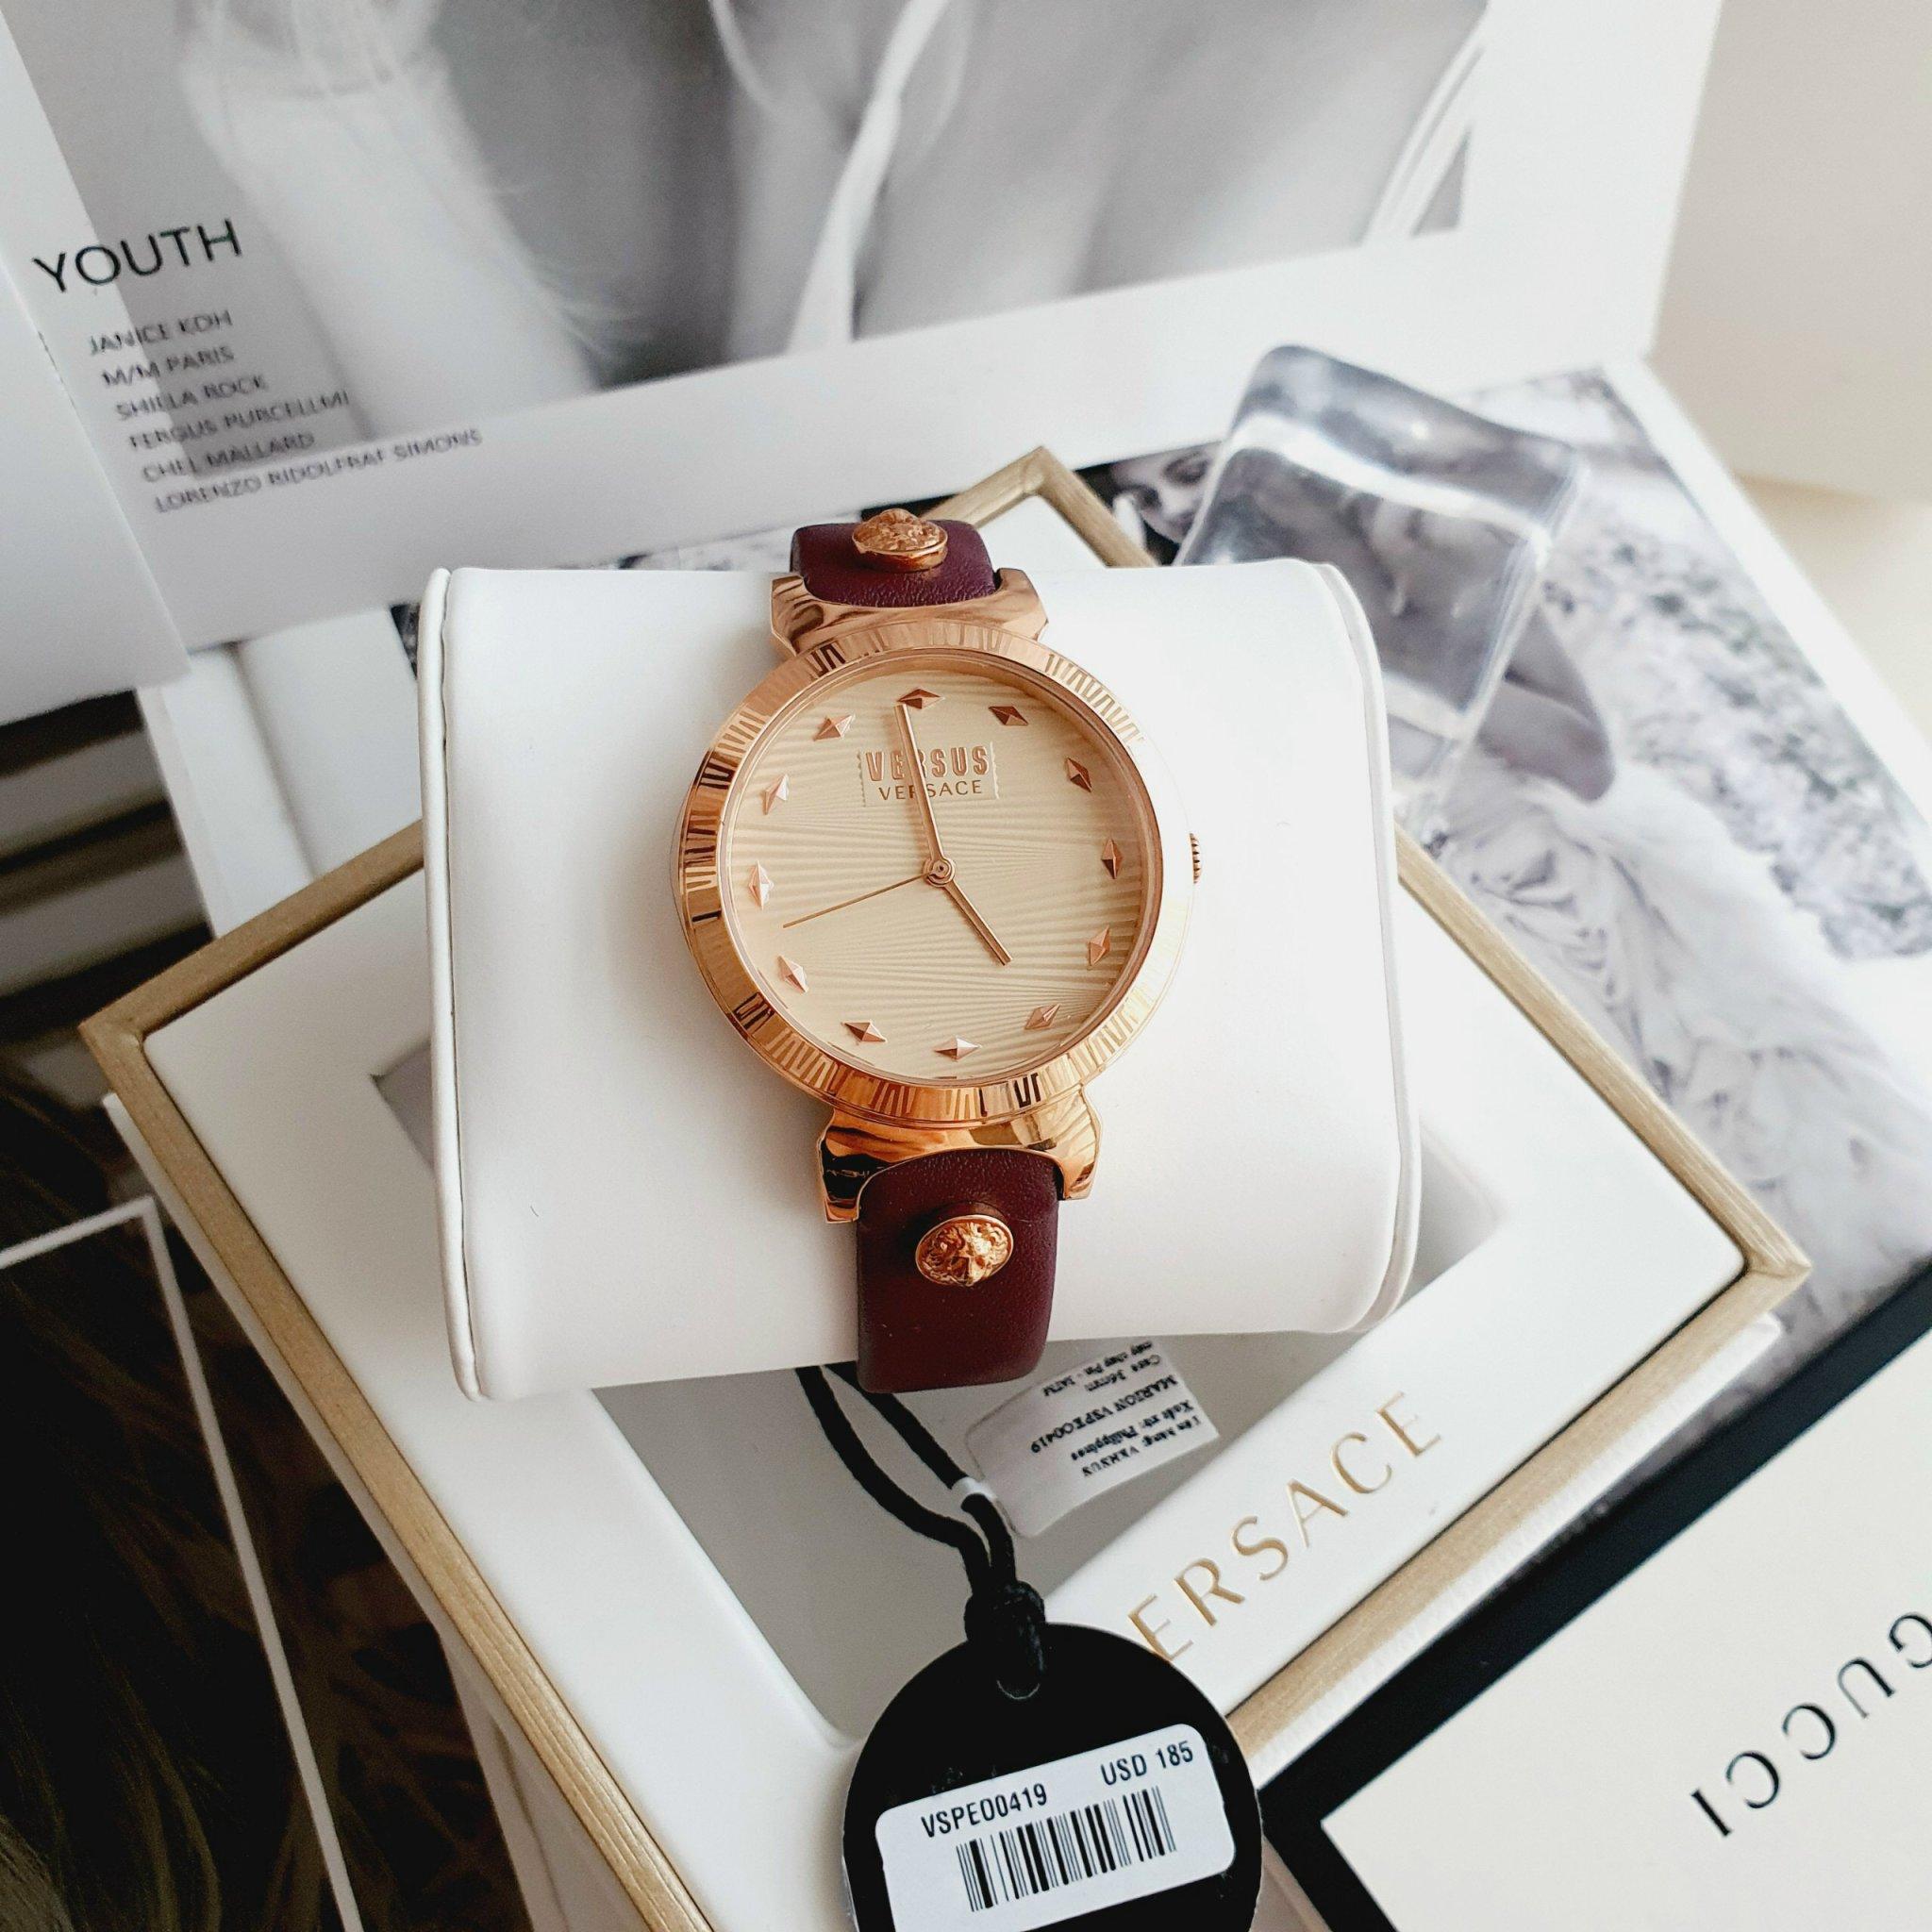 Đồng hồ hãng V.e.r.s.u.s by V.e.r.s.a.c.e